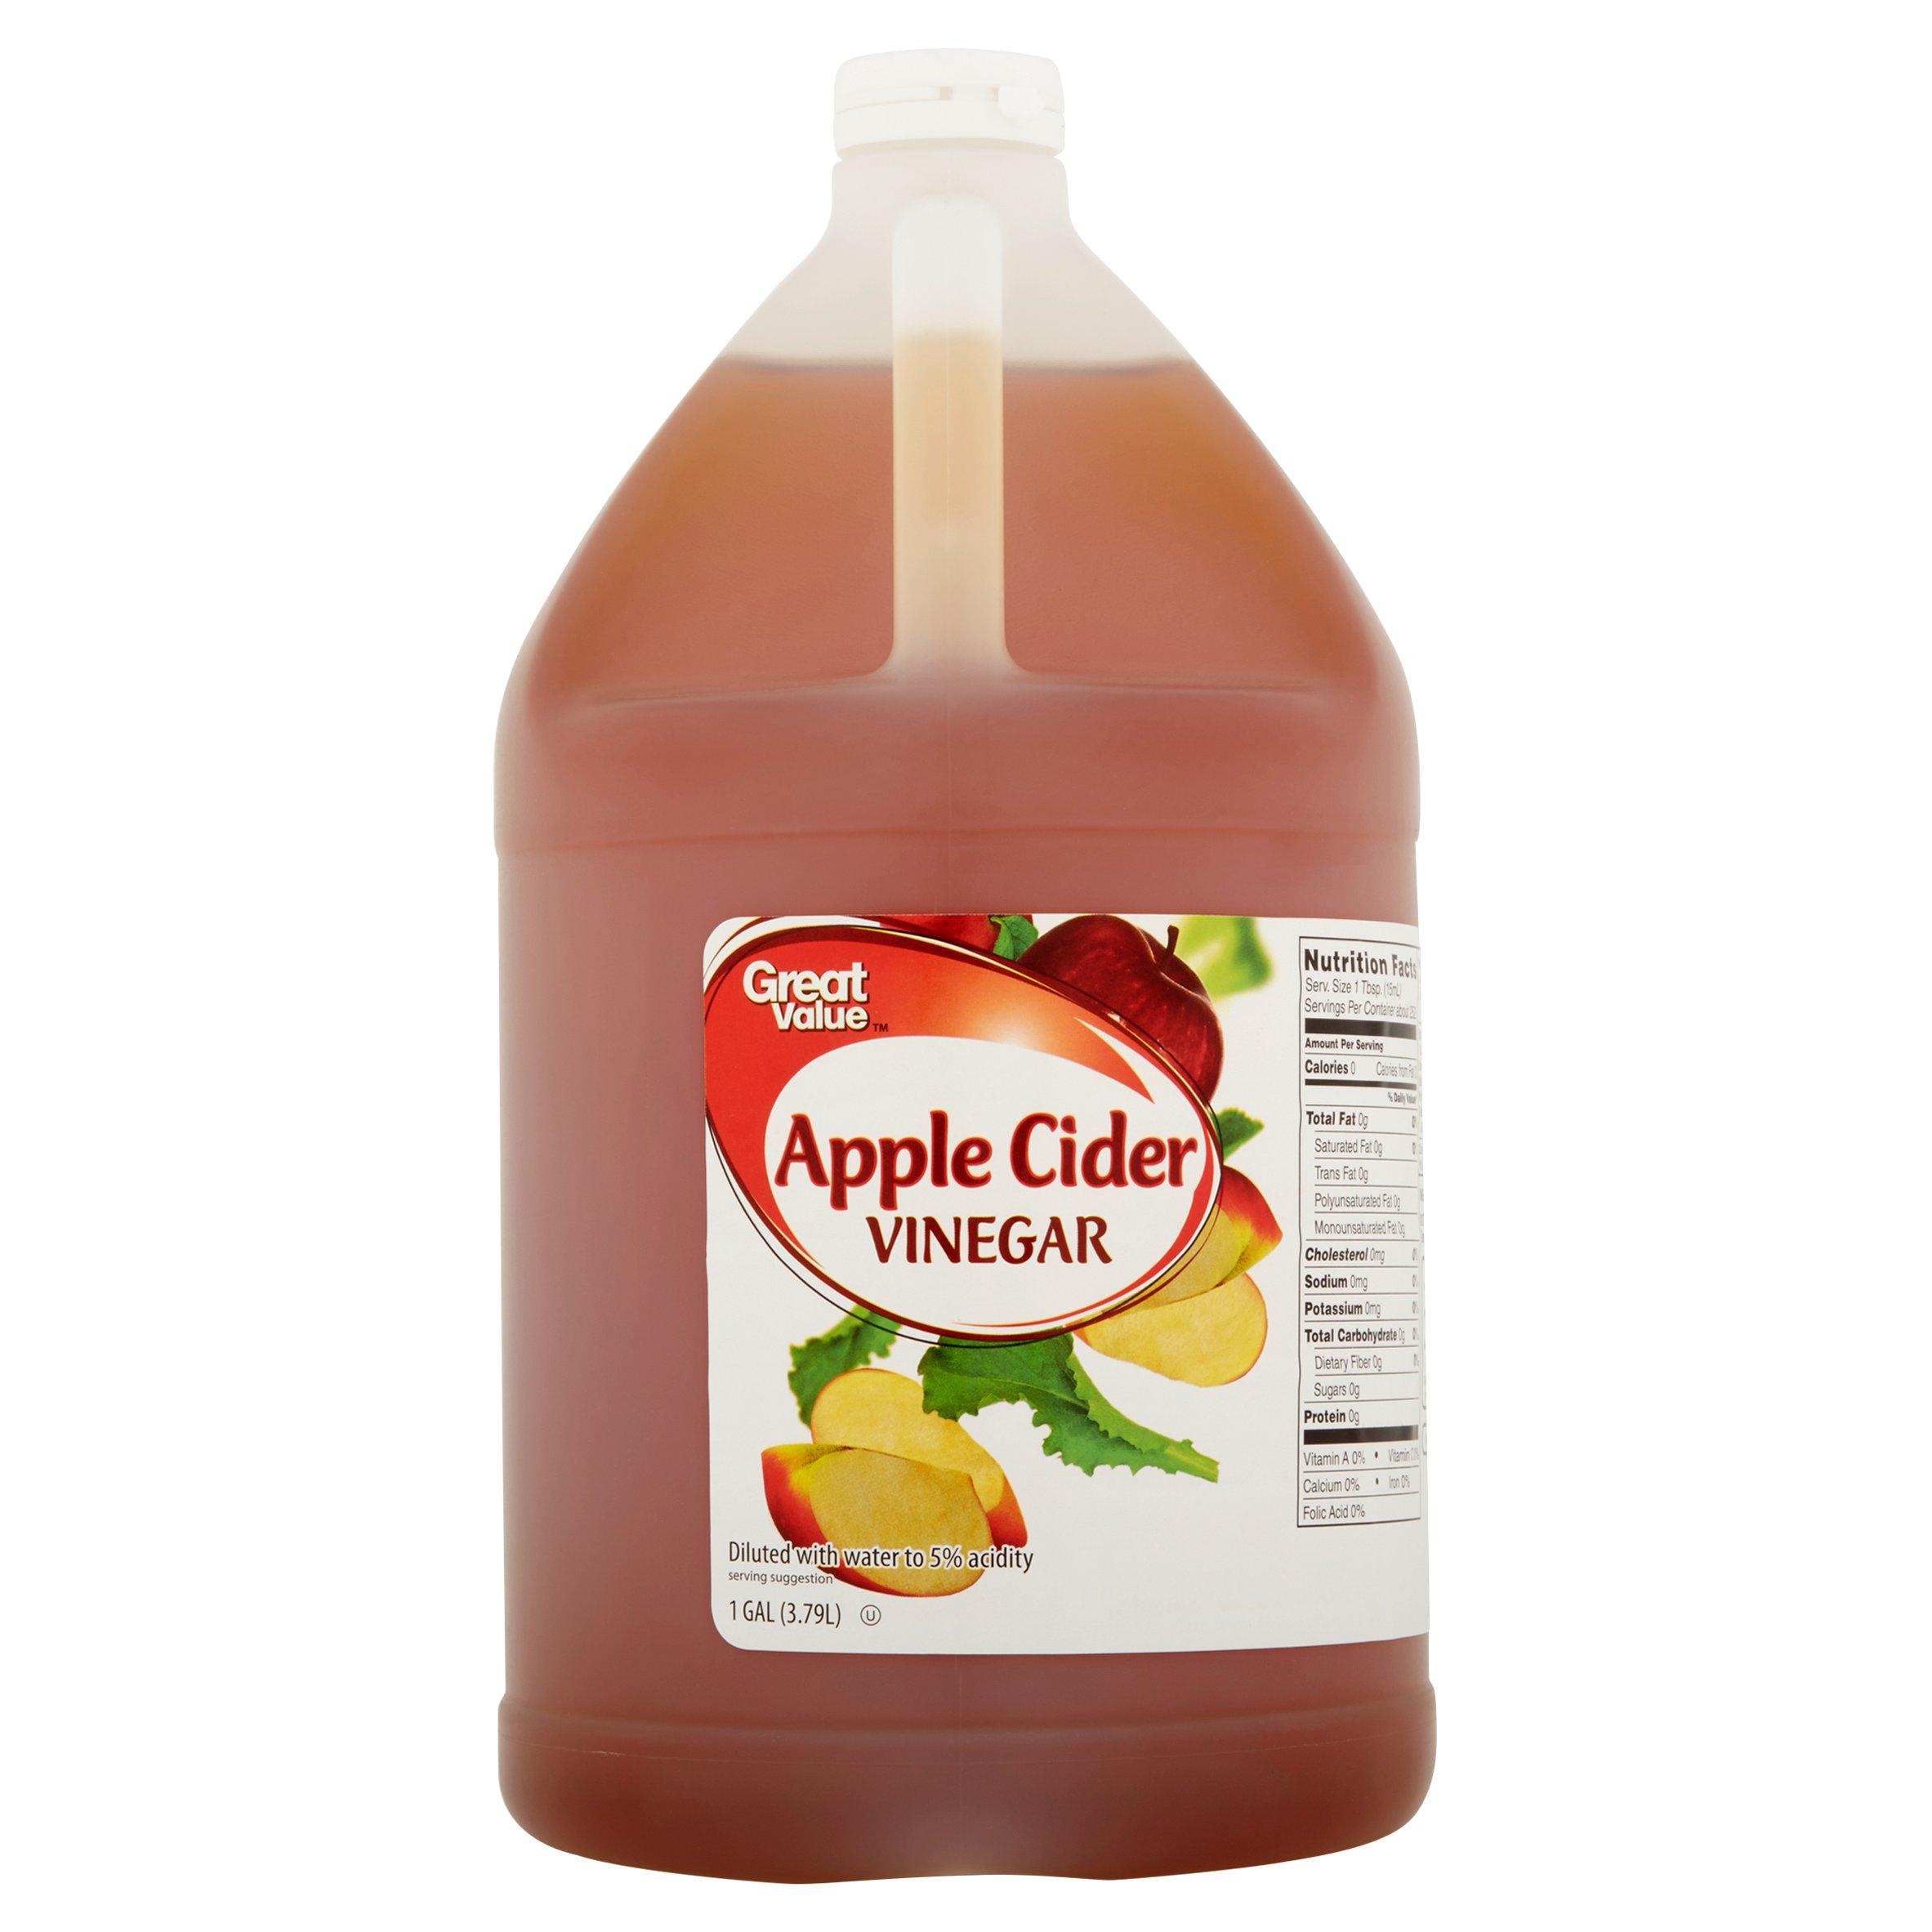 Great Value Apple Cider Vinegar, 1 gal